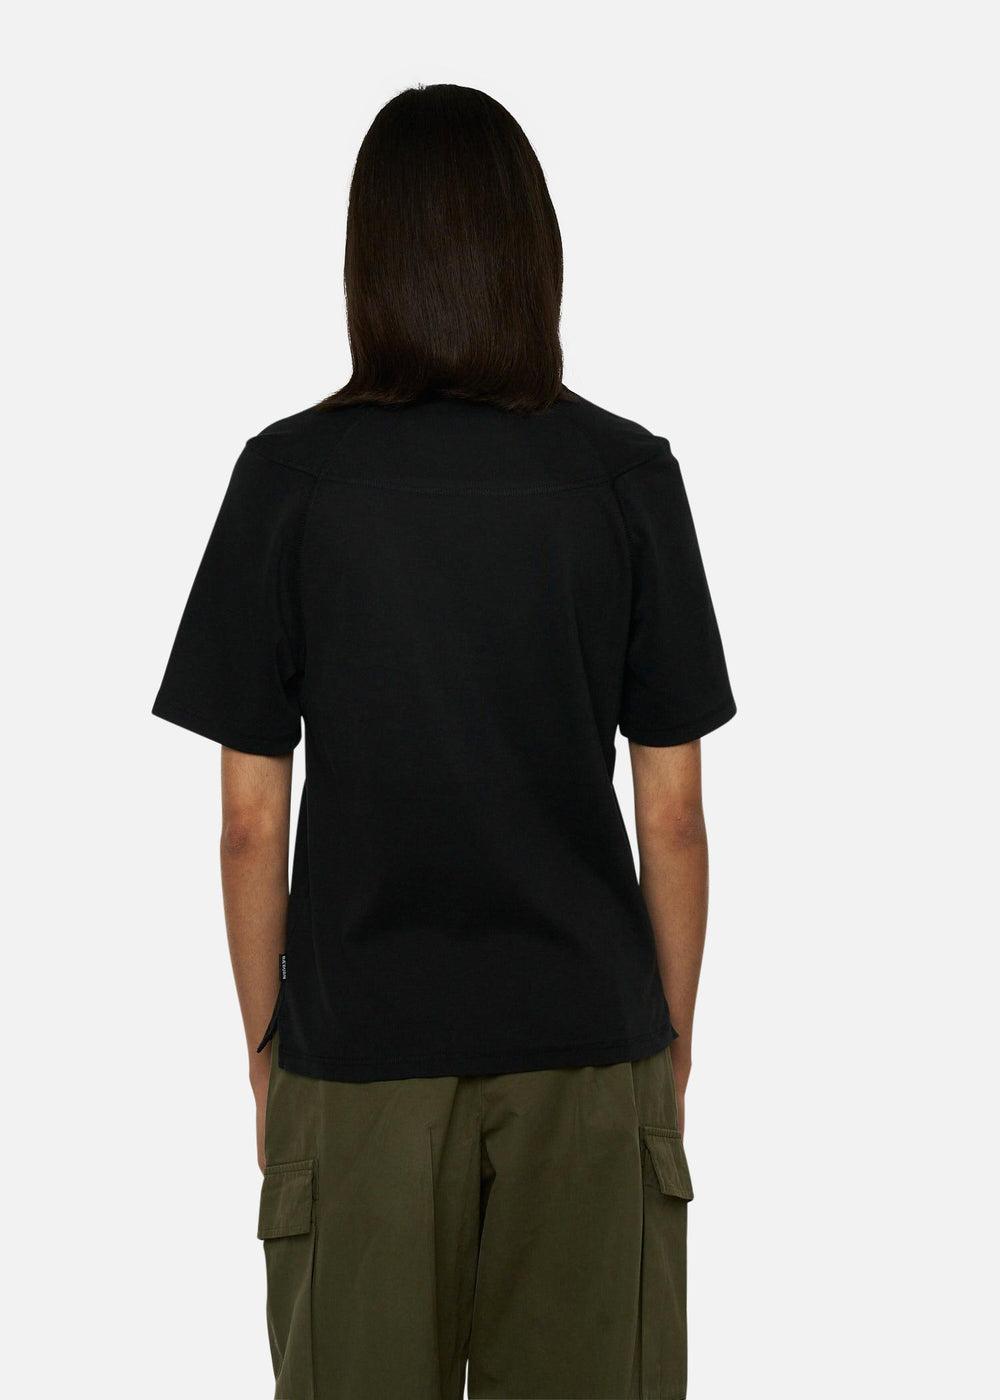 Raeburn SI ETHOS TEE (W) BLACK